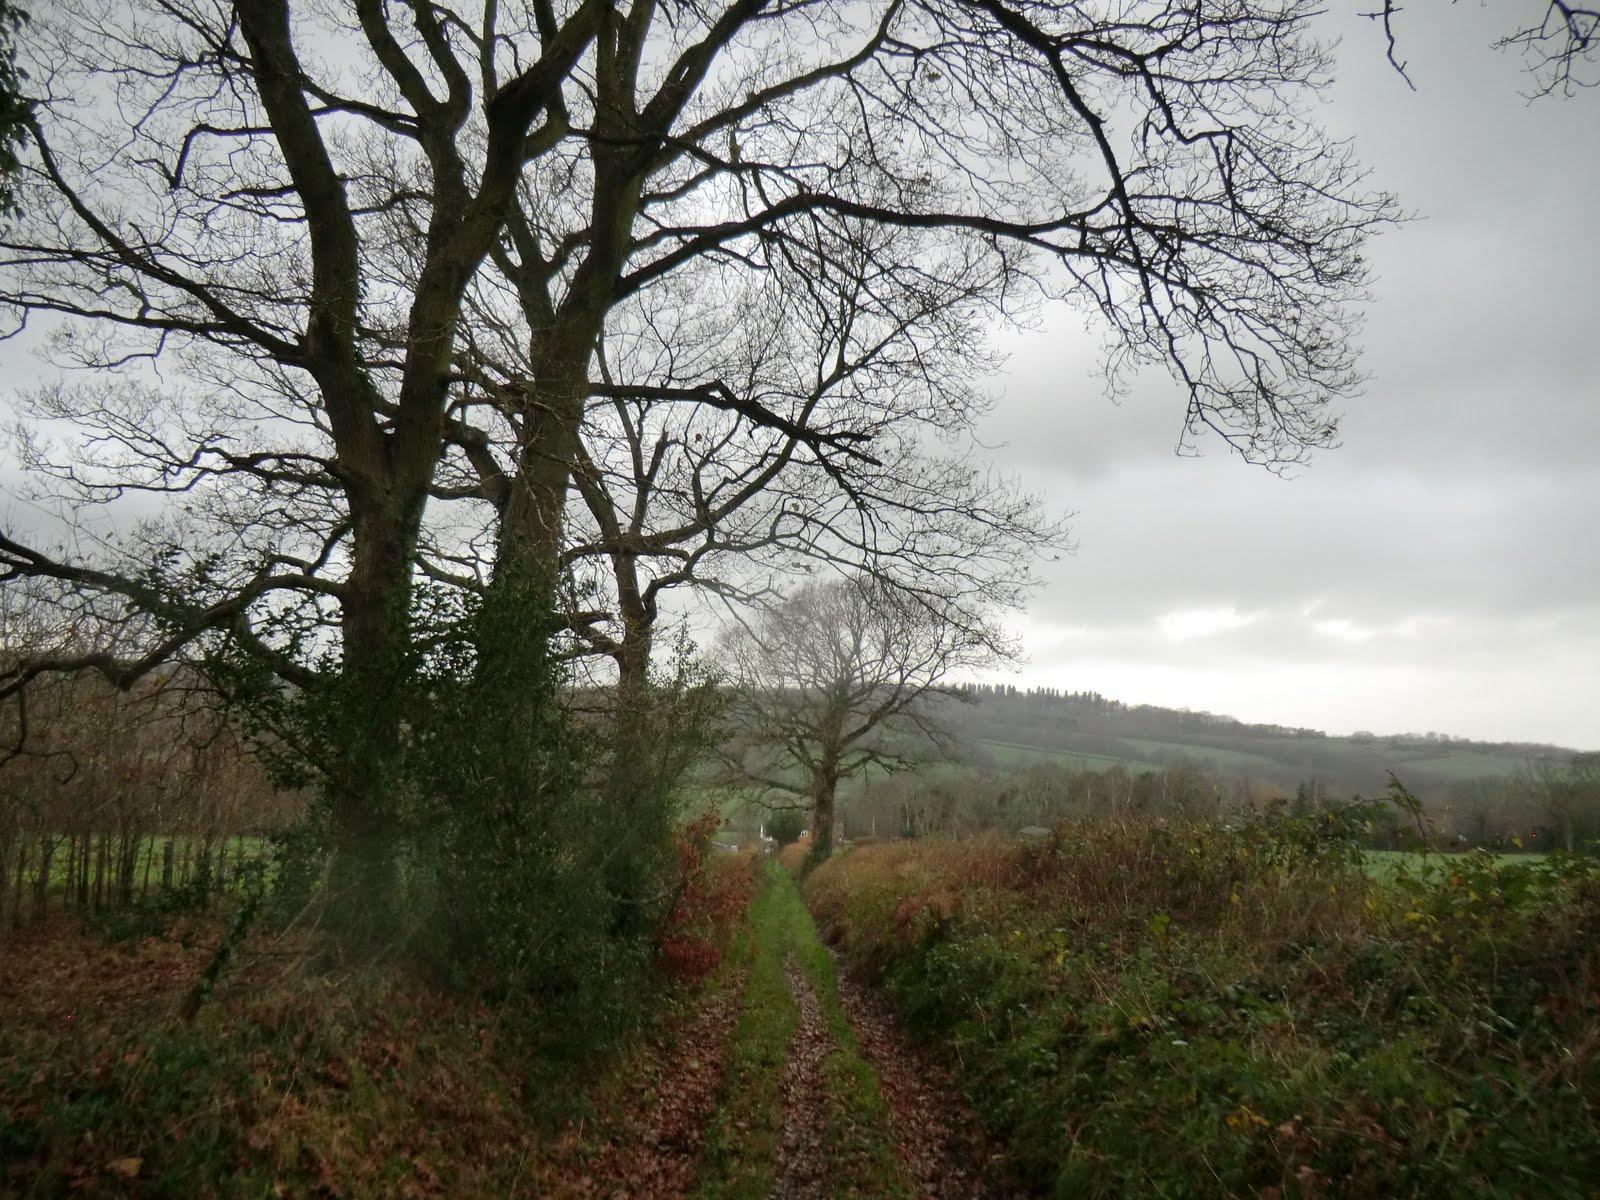 CIMG2010 Track to Jessup's Farm